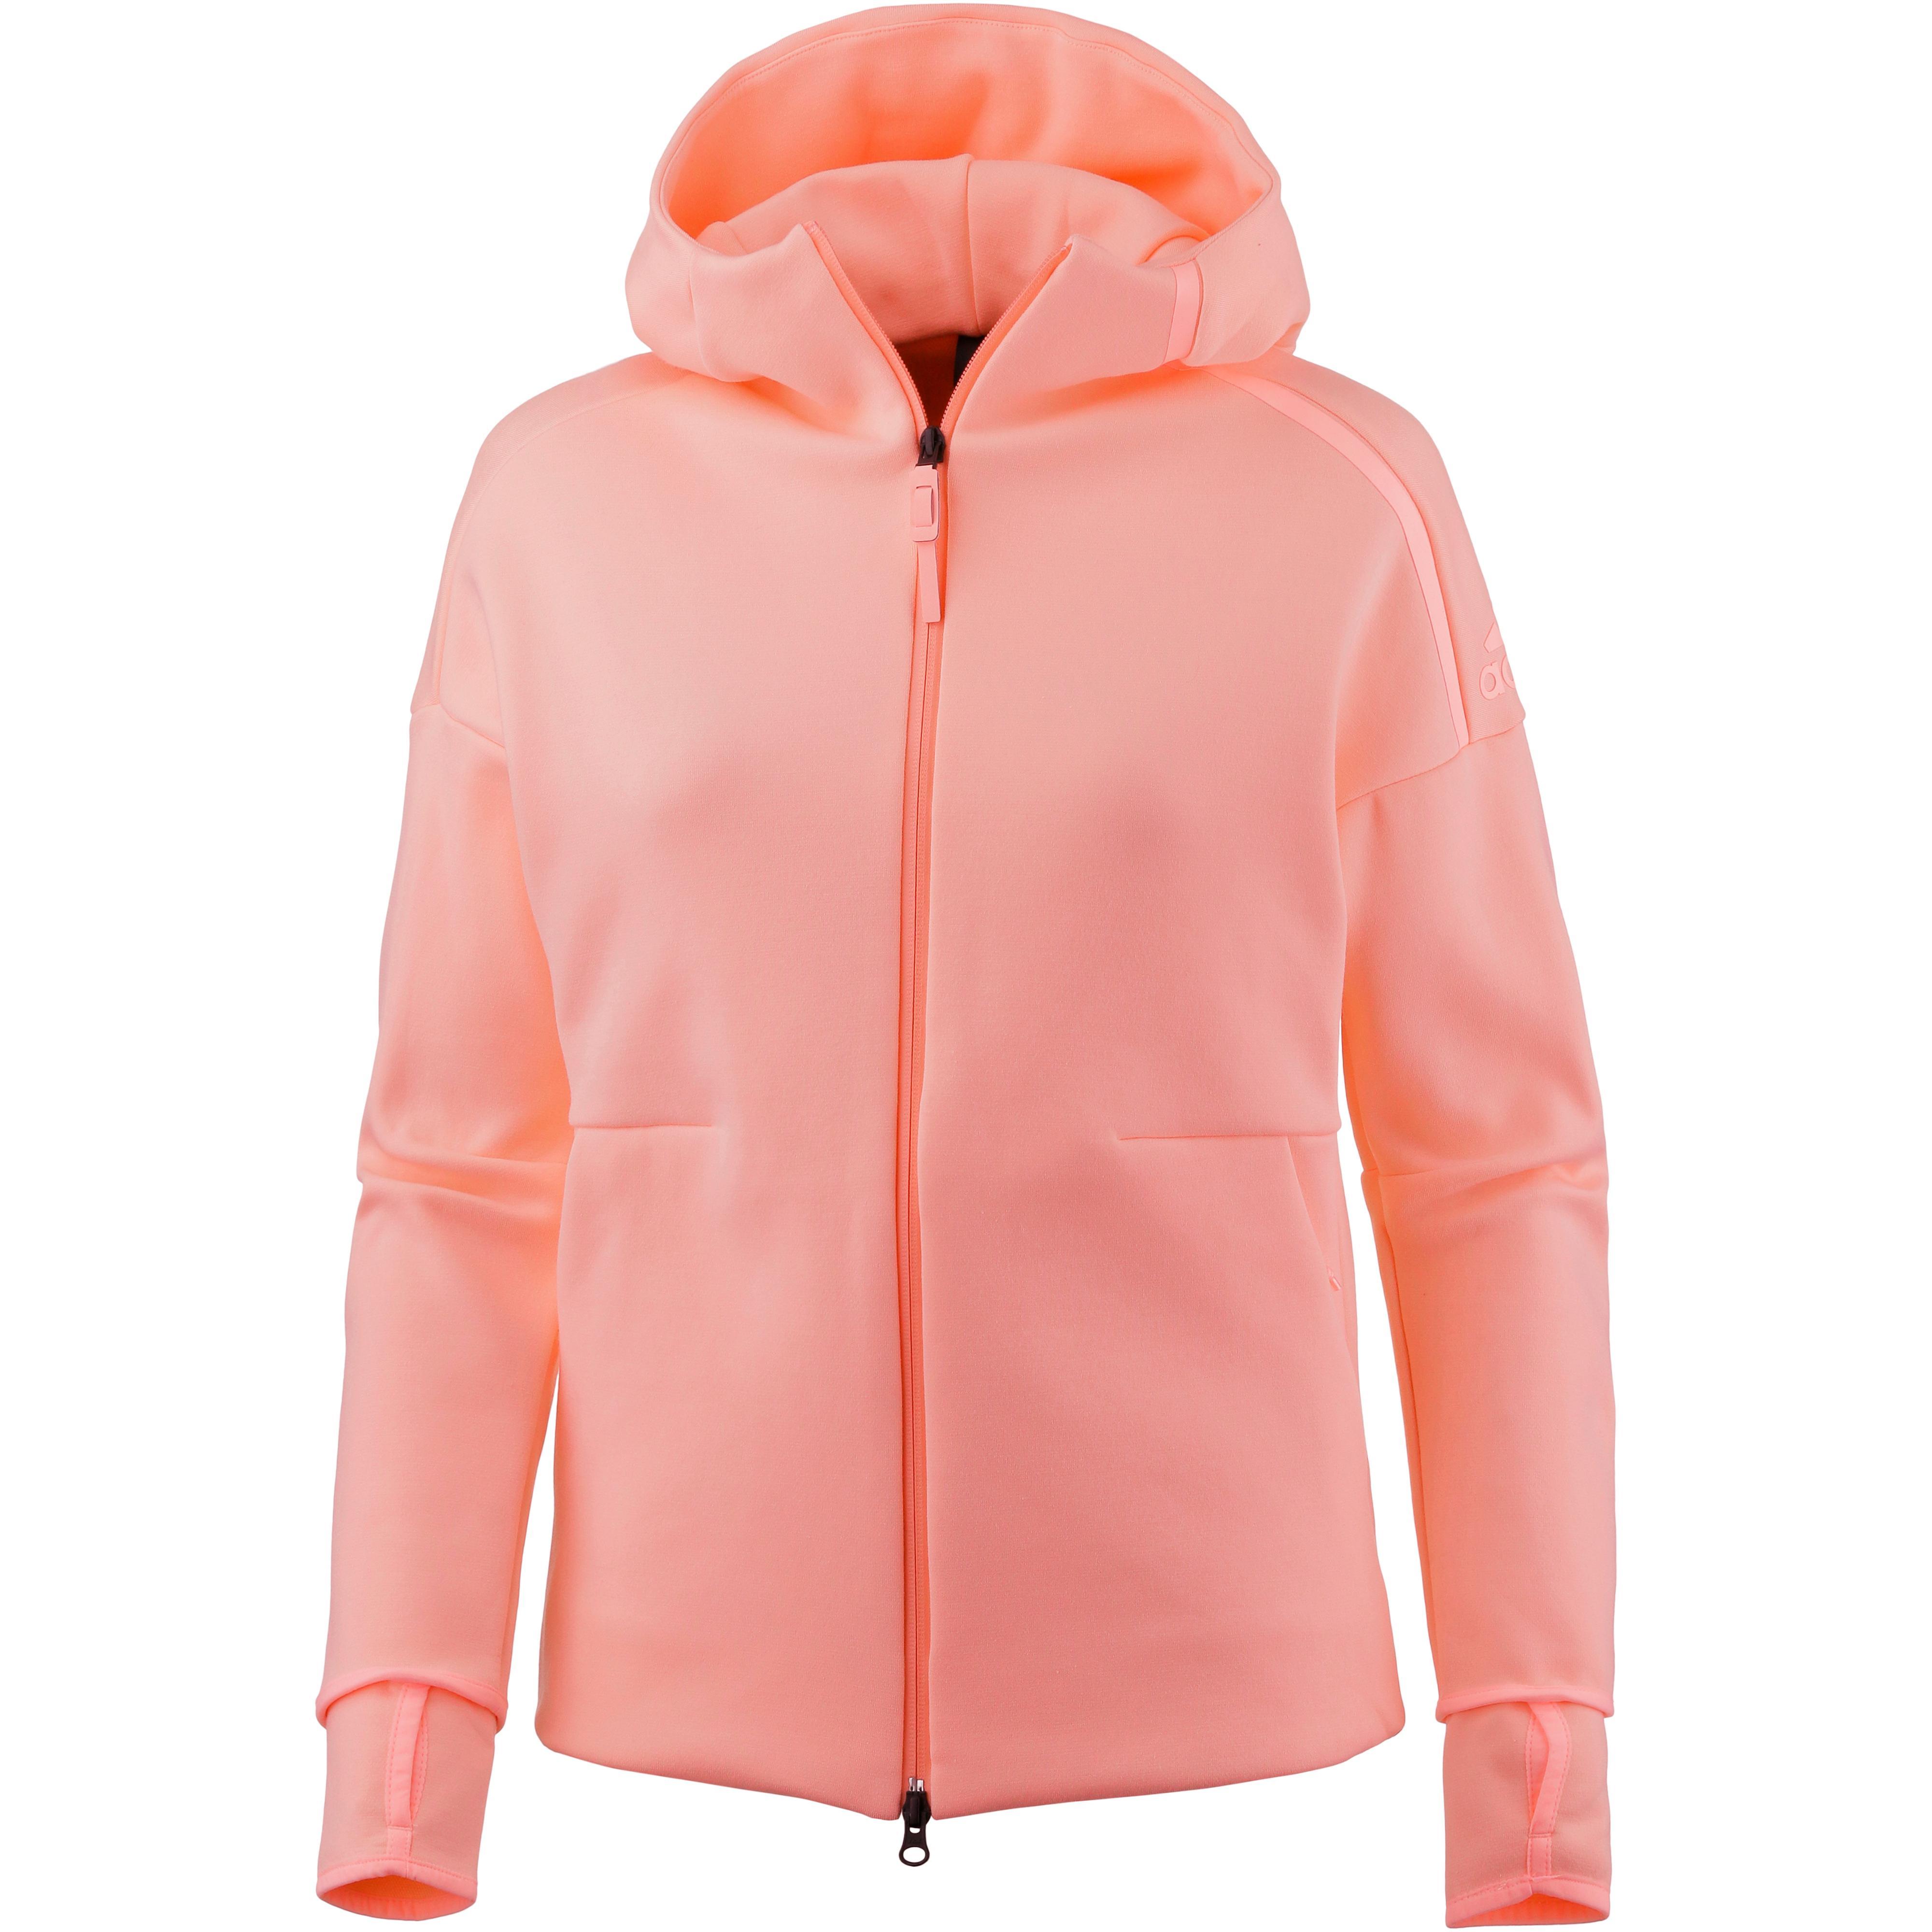 Adidas damen jacke rosa